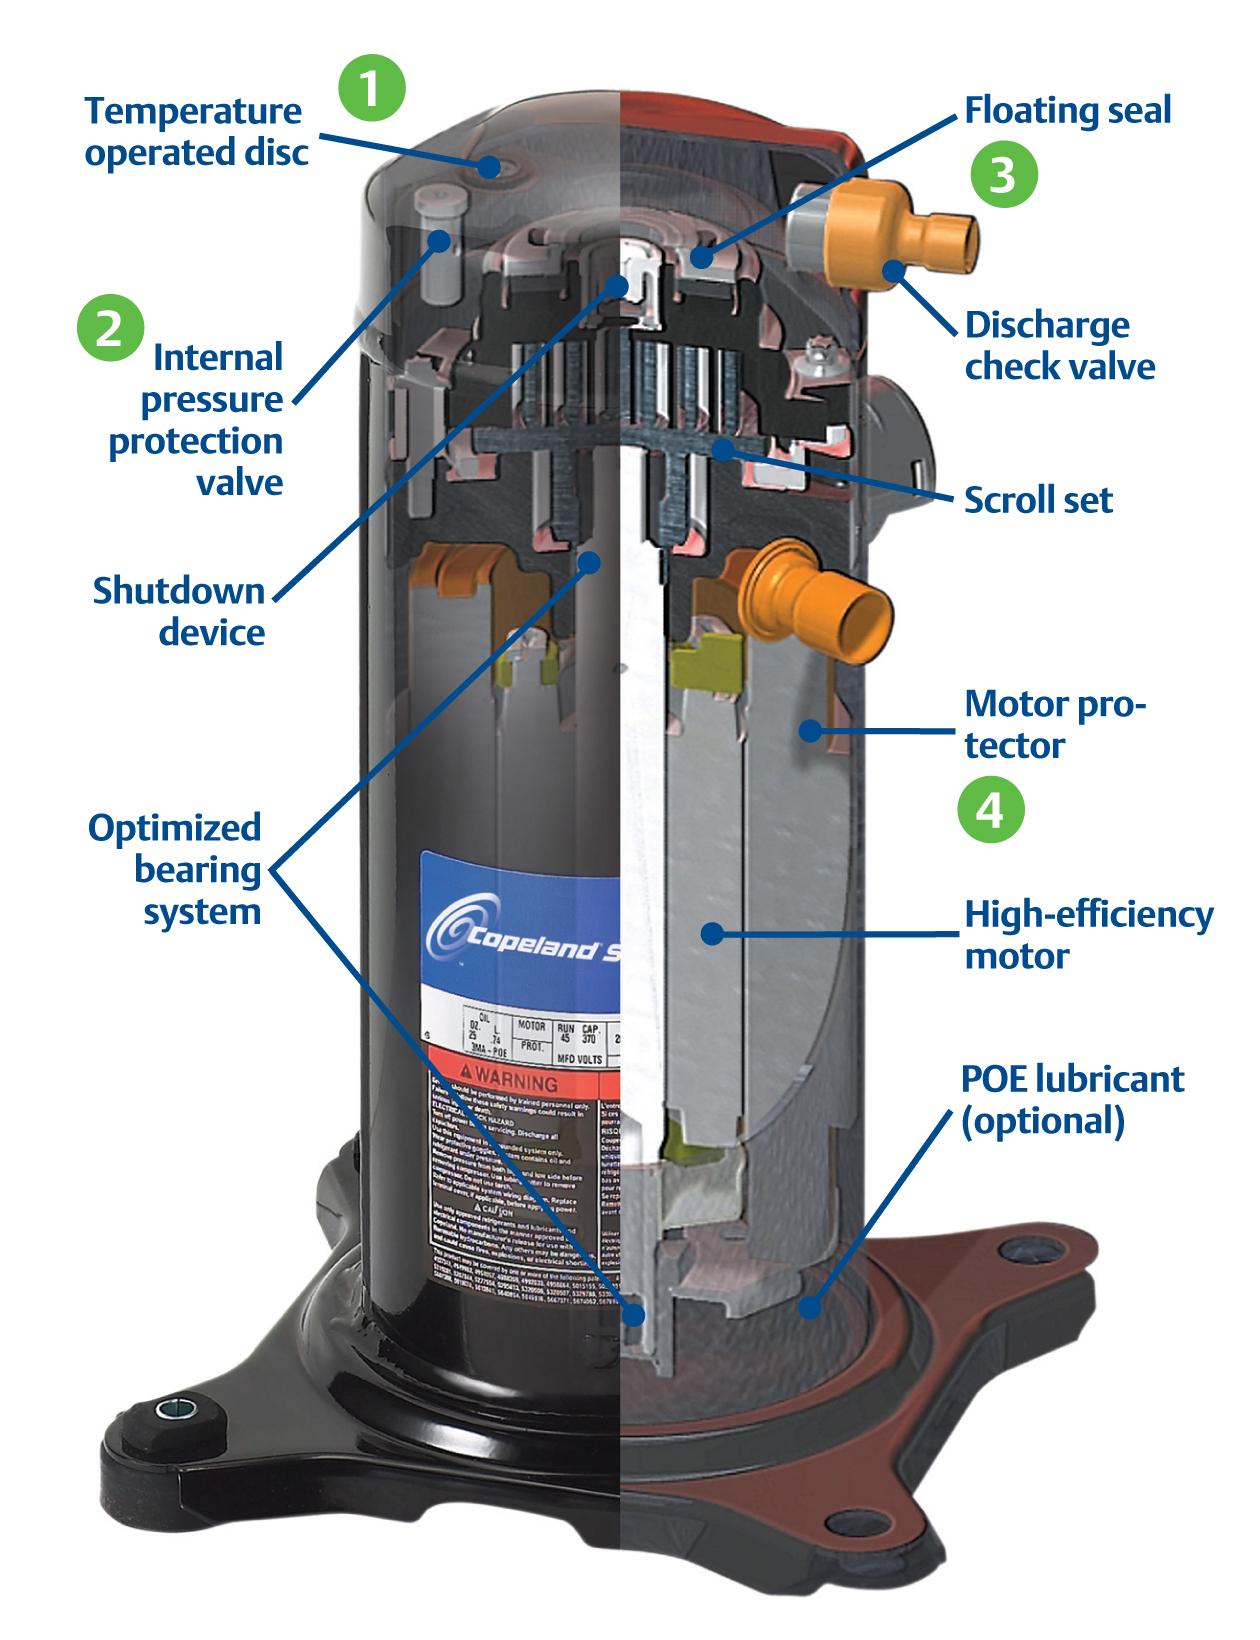 ac compressor pontiac aztek radio wiring diagram how does freon aka refrigerant works in an air conditioner